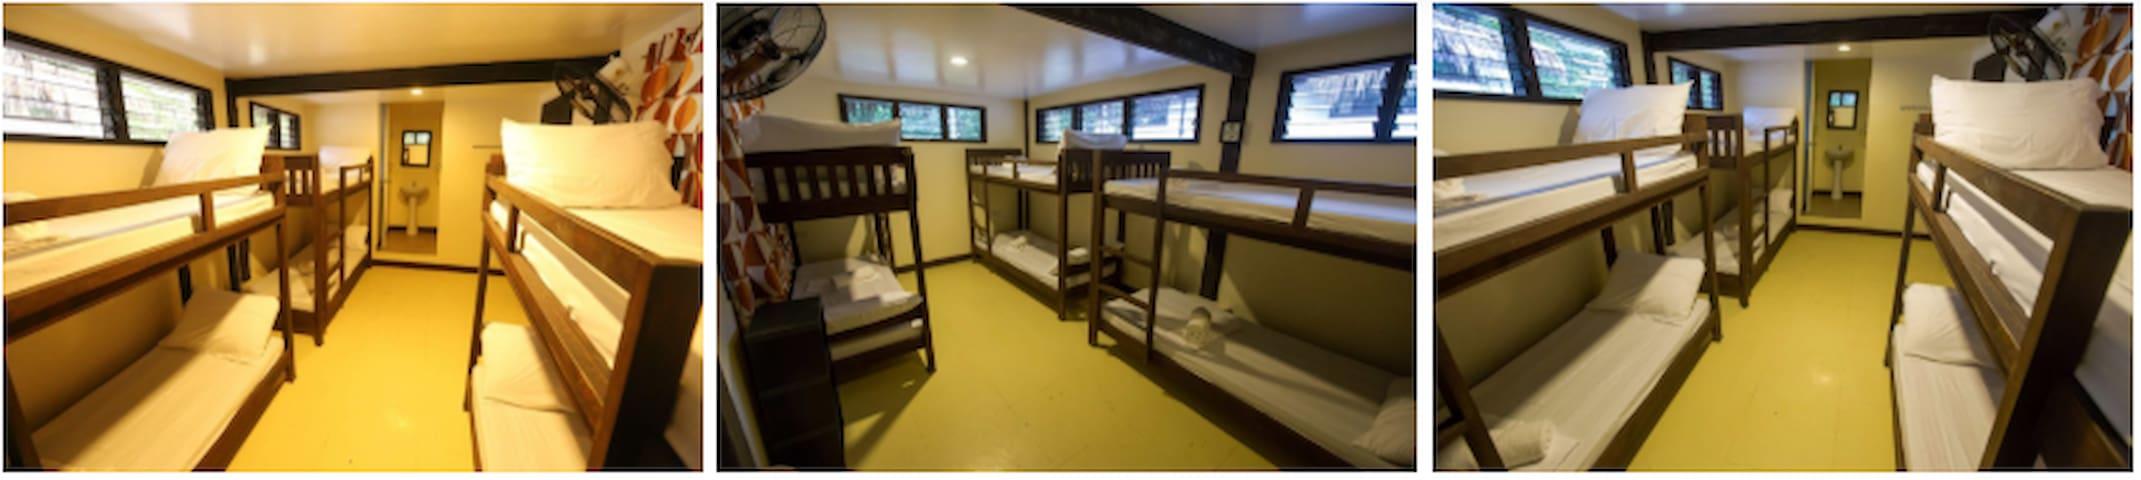 Dormitory room for 6 pax at Tejero Highland Resort